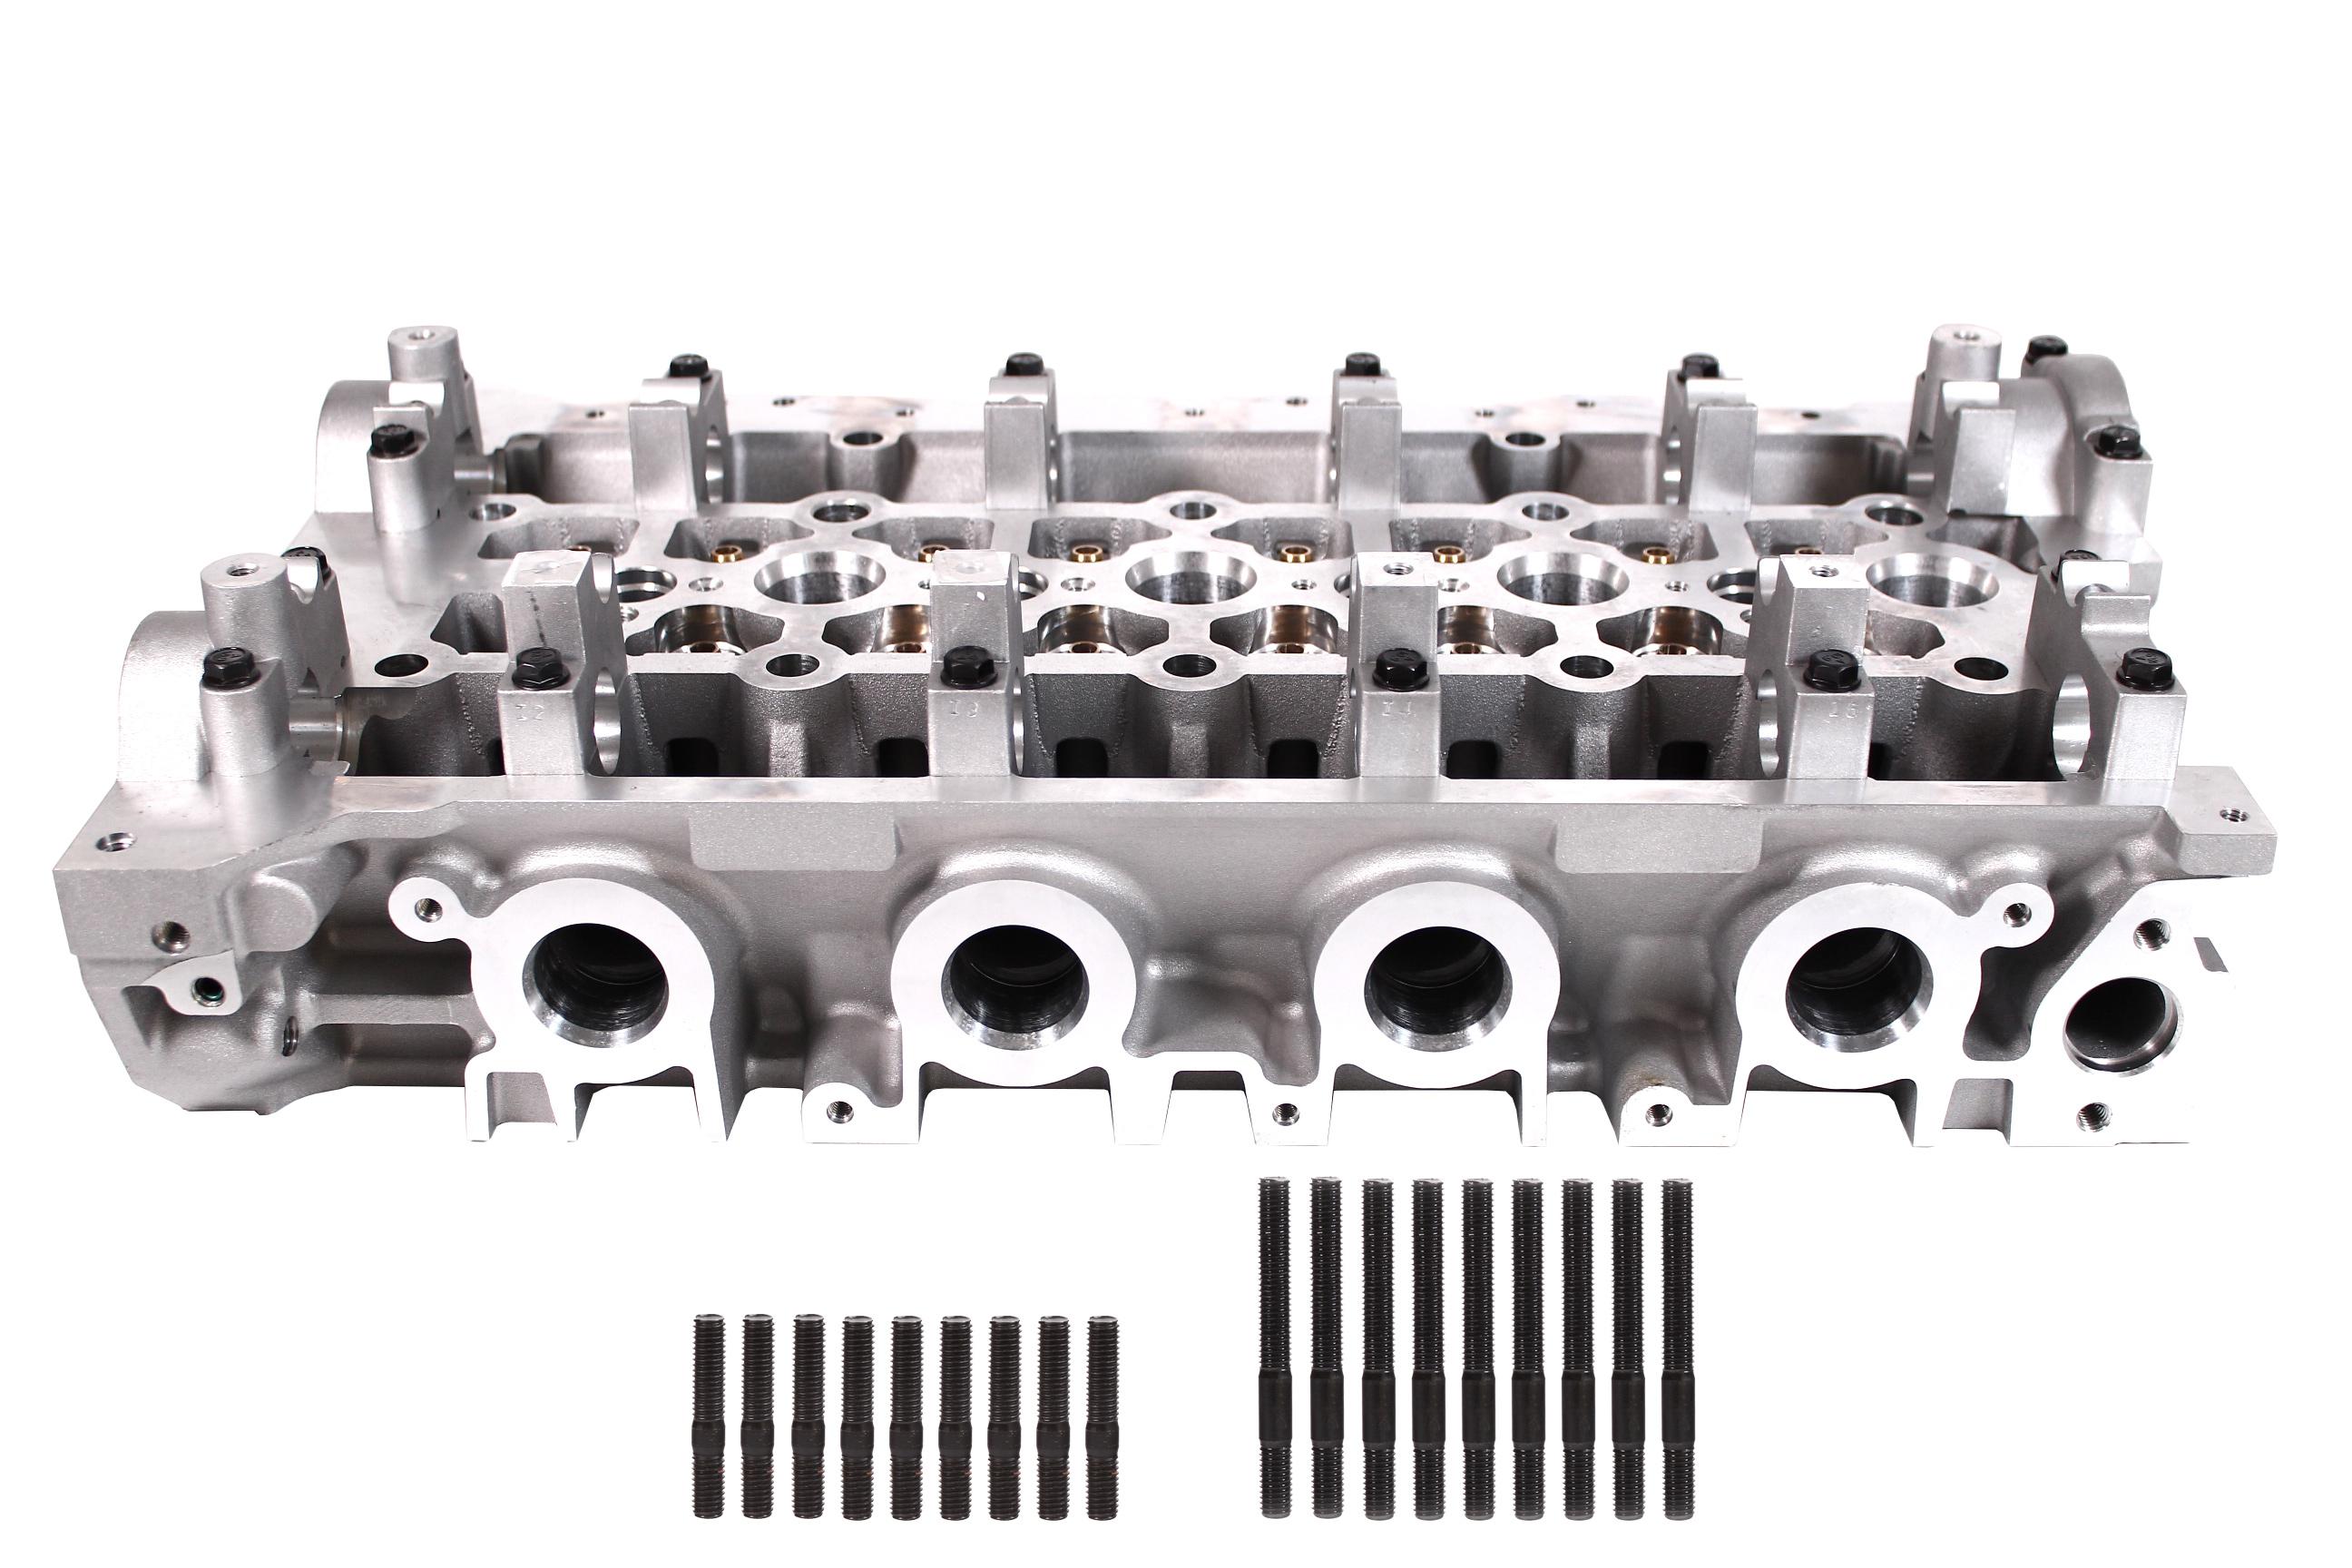 Zylinderkopf Nissan Primastar X83 2,5 2,5 dCi G9U G9U730 1104100QA0  NEU